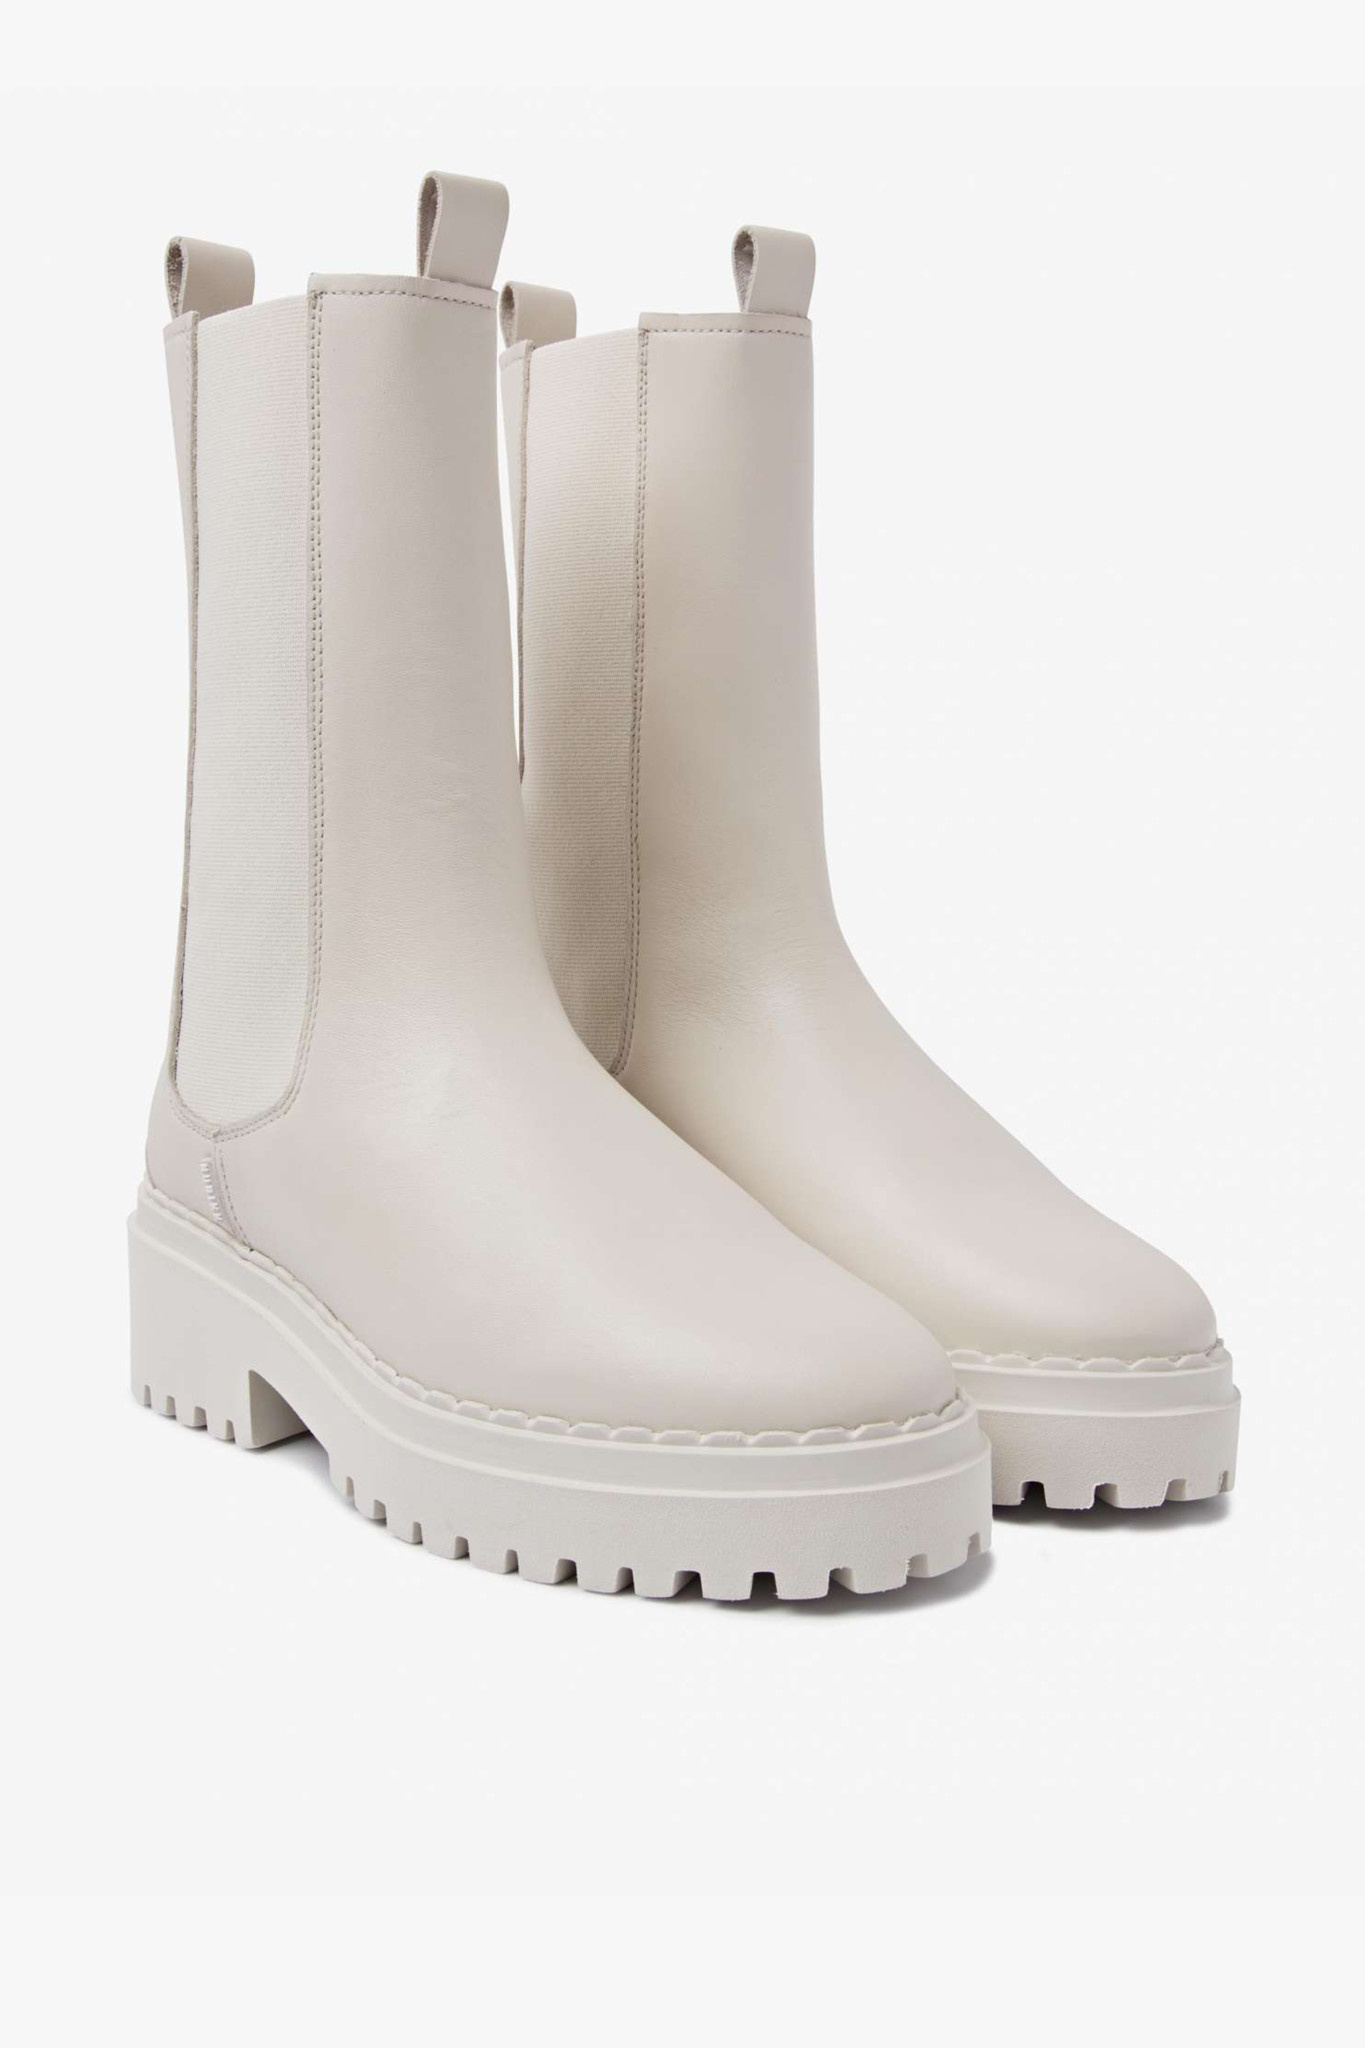 Fae Adams Chelsea Boot - Desert-1